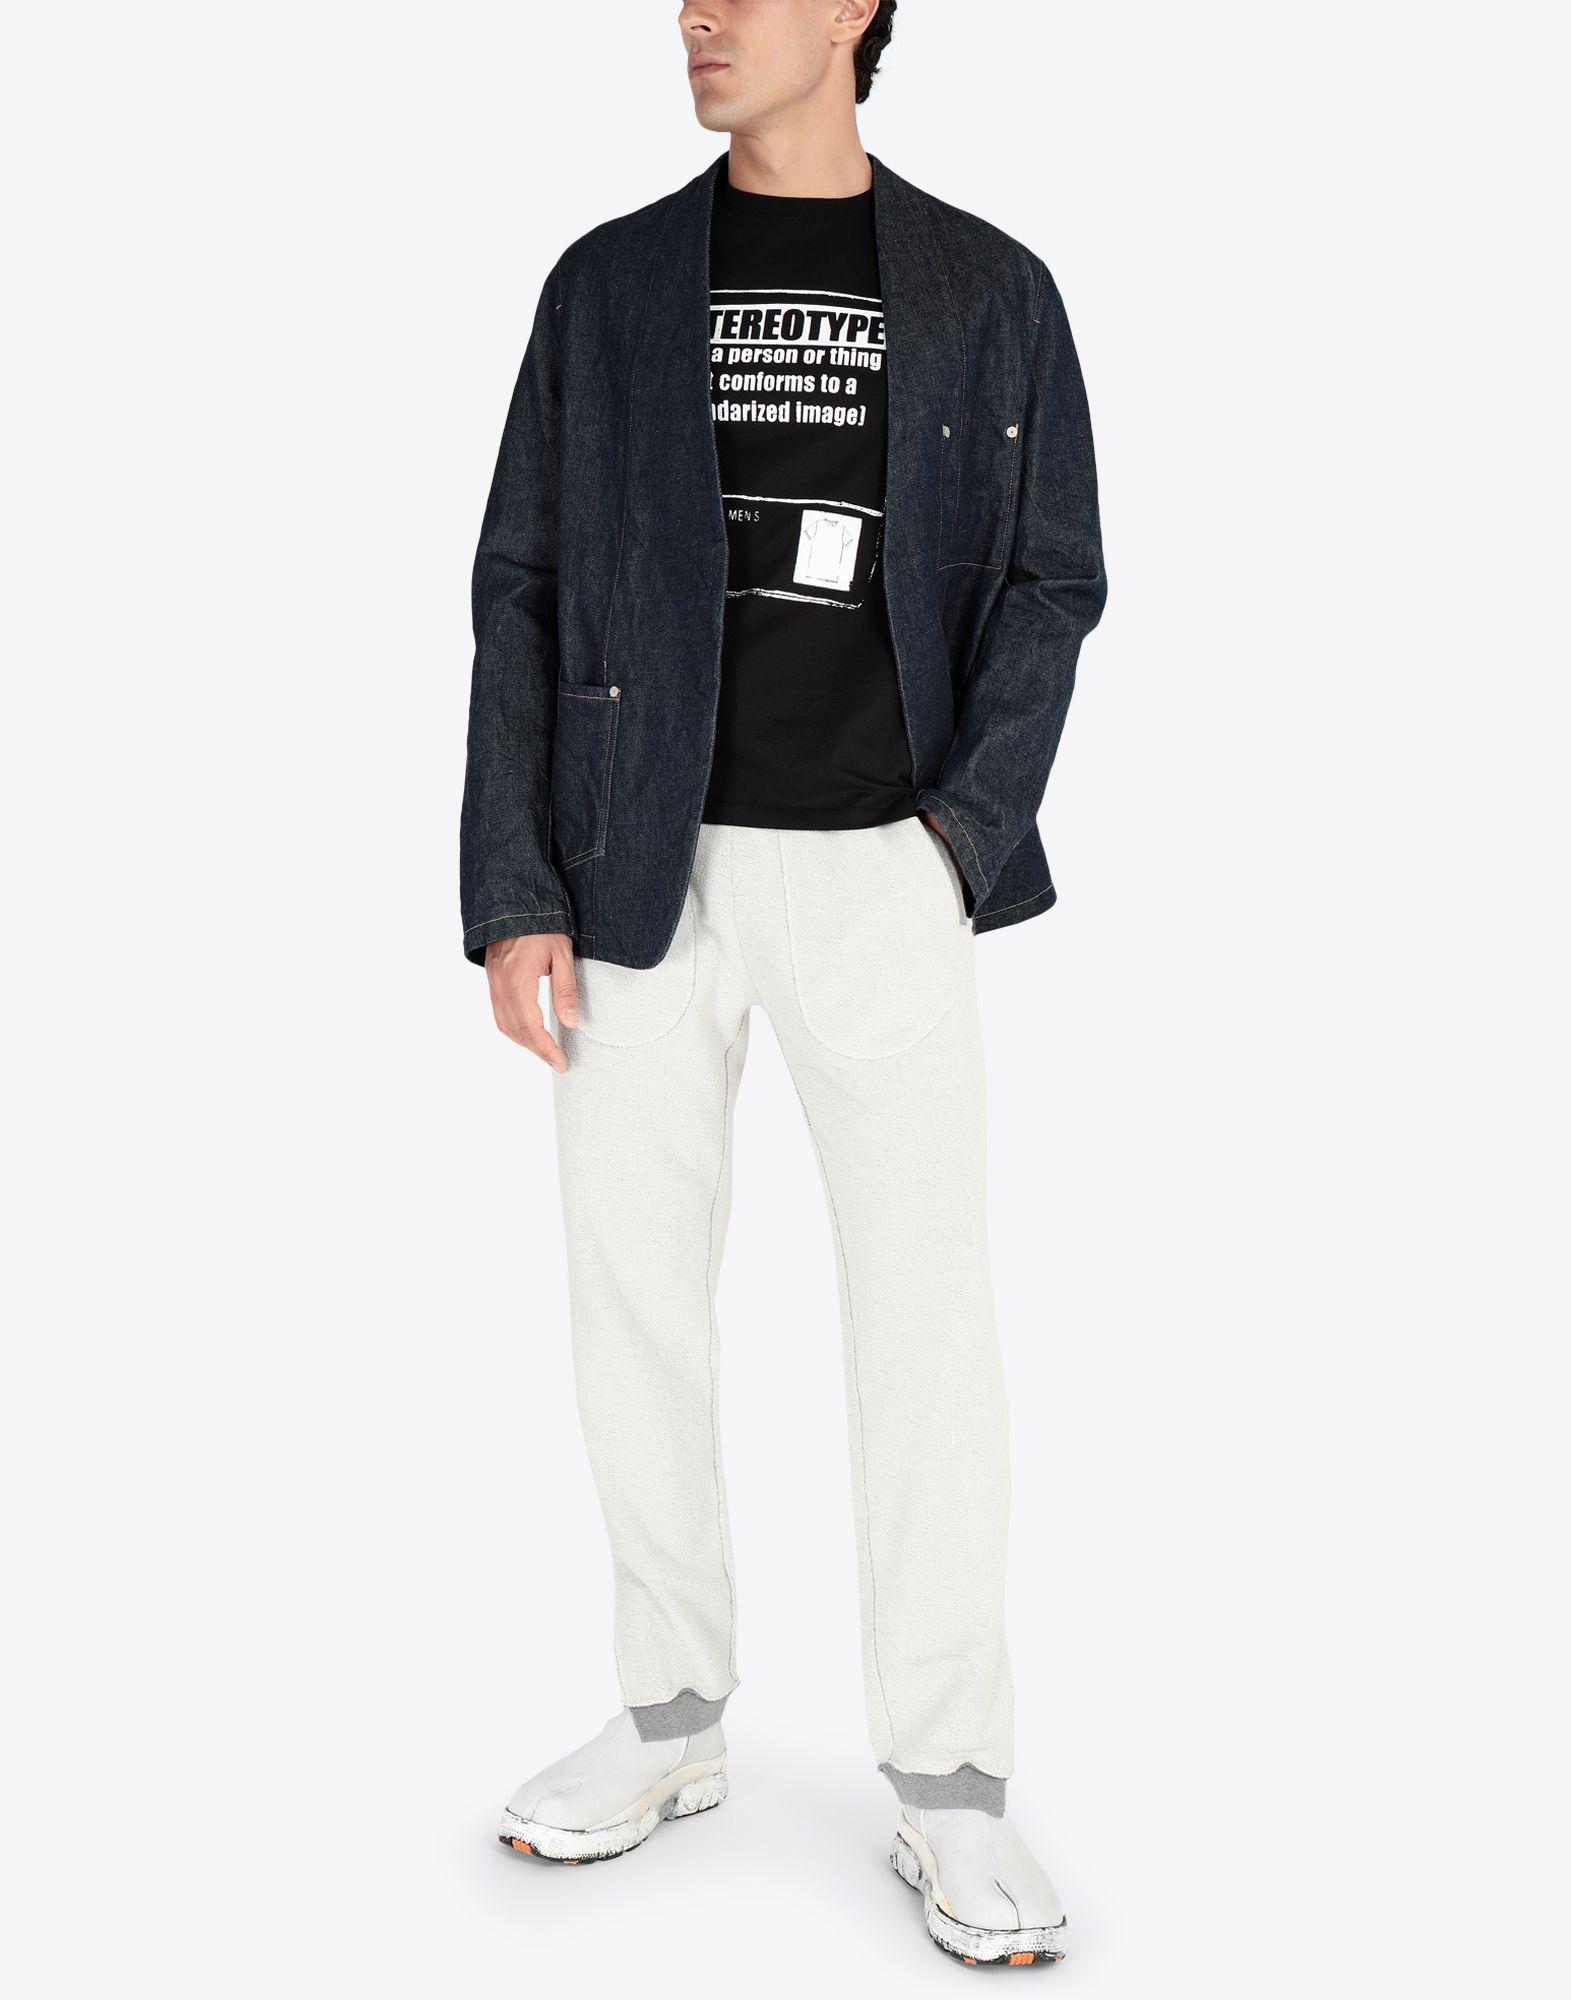 MAISON MARGIELA Stereotype' コットンTシャツ T シャツ メンズ d